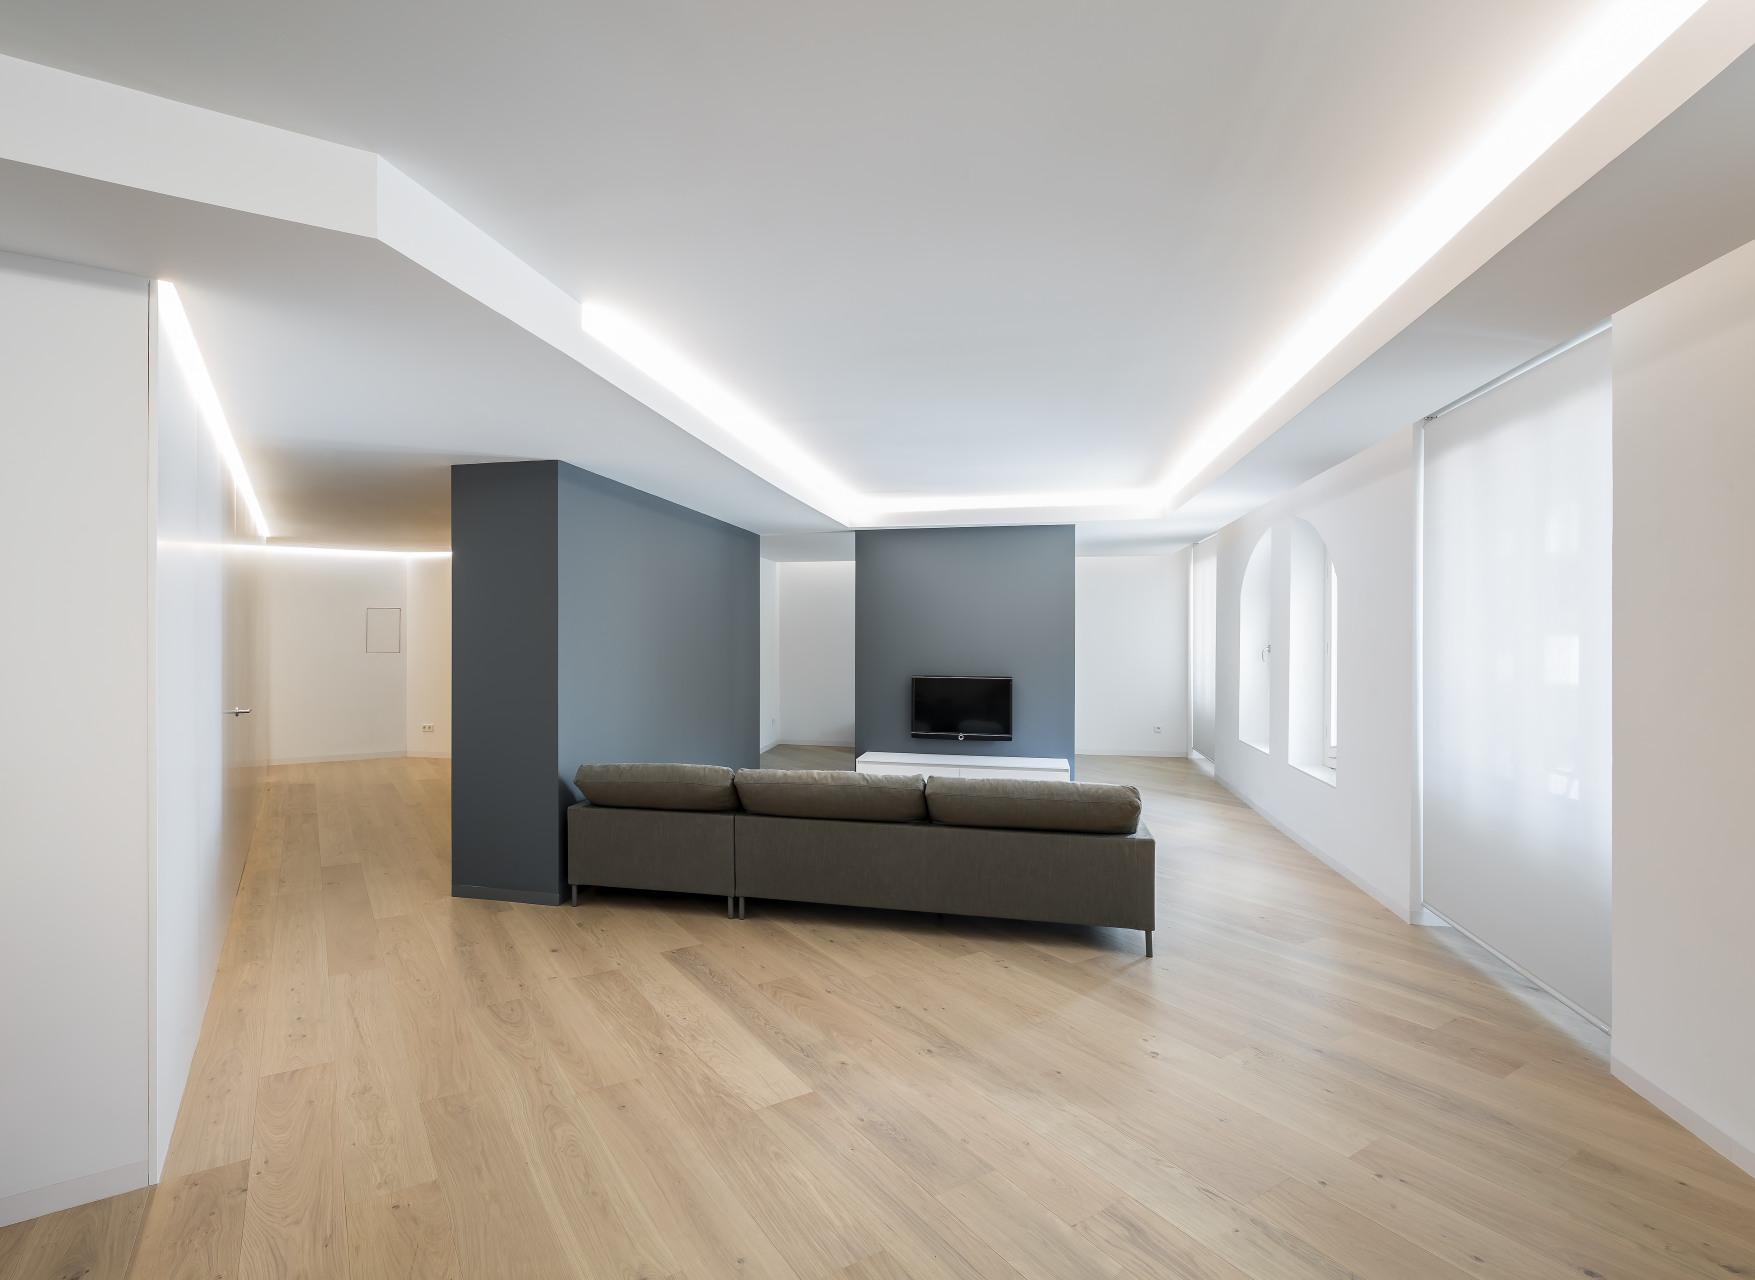 fotografia-arquitectura-interiorismo-valencia-german-cabo-gallardo-llopis-bfm-edificatoria-turia02 (14)